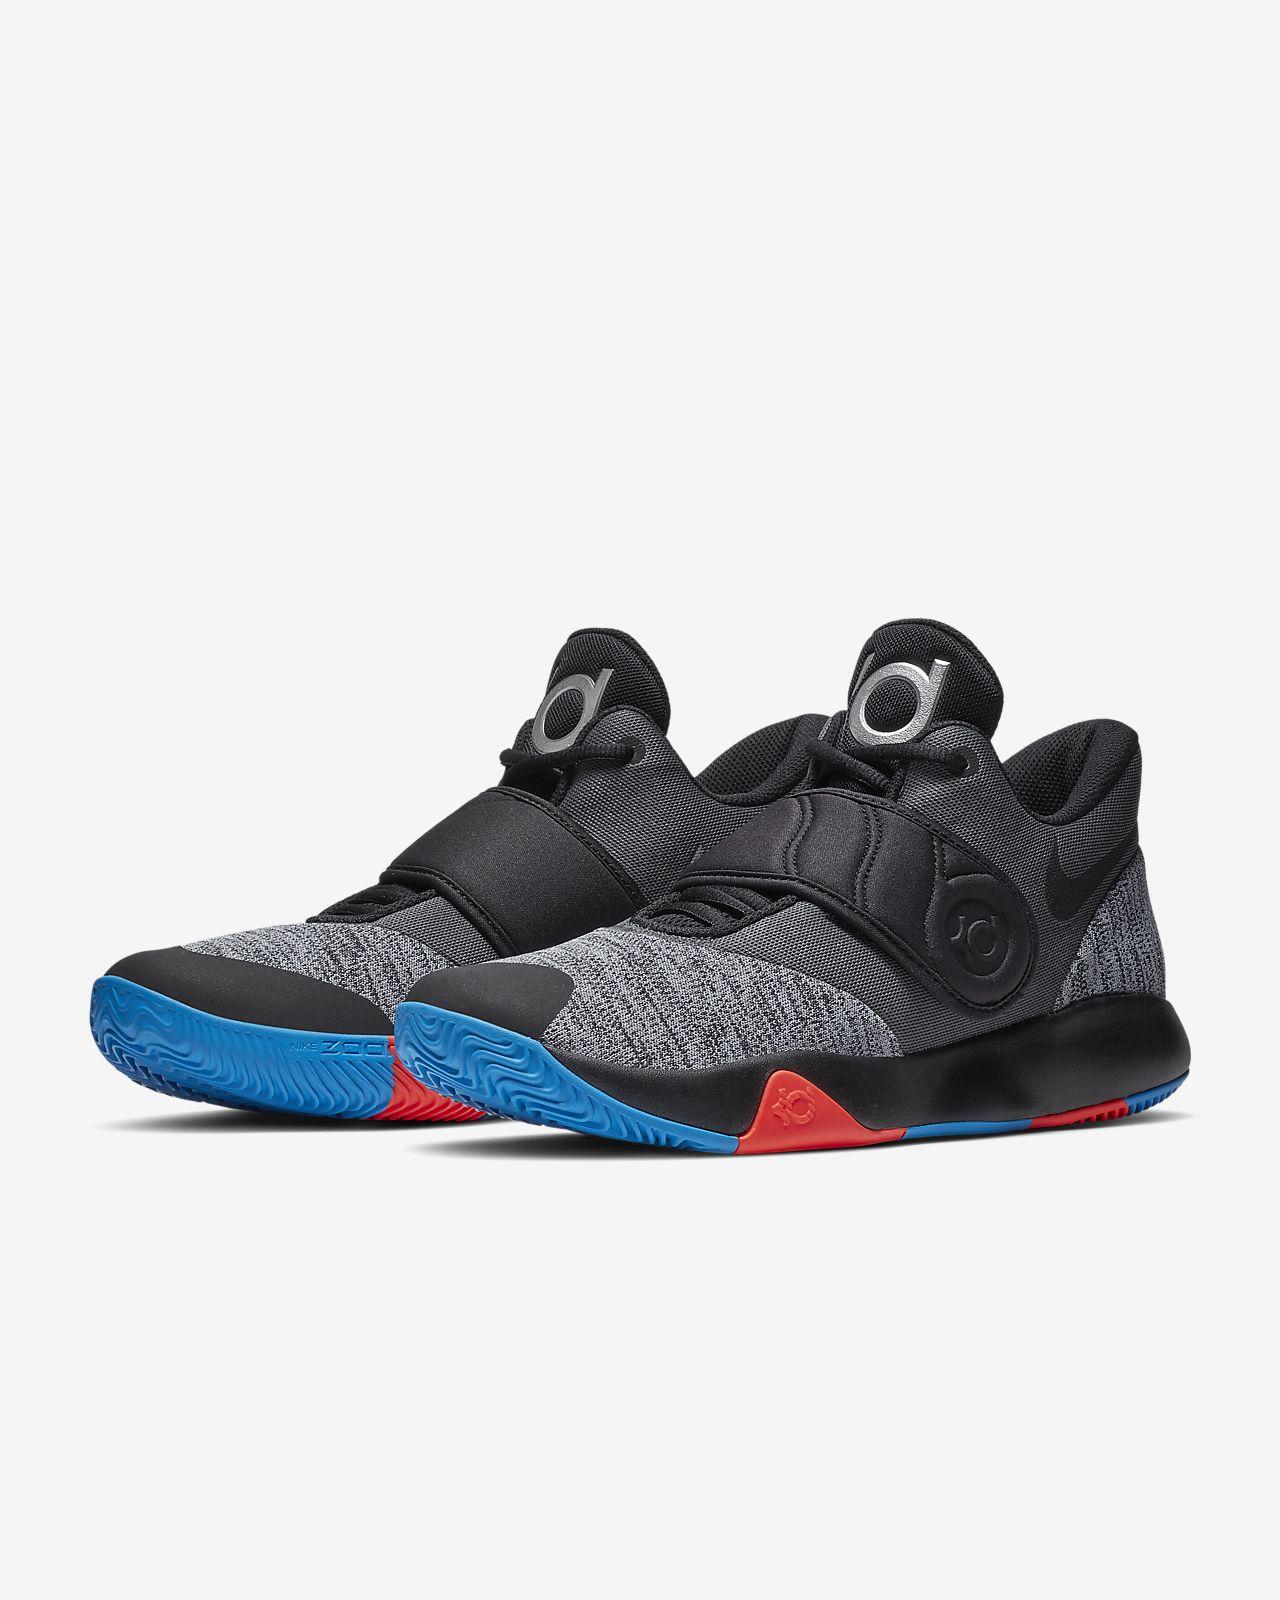 best loved 9a69f 7caae ... Nike KD Trey 5 VI Basketball Shoe